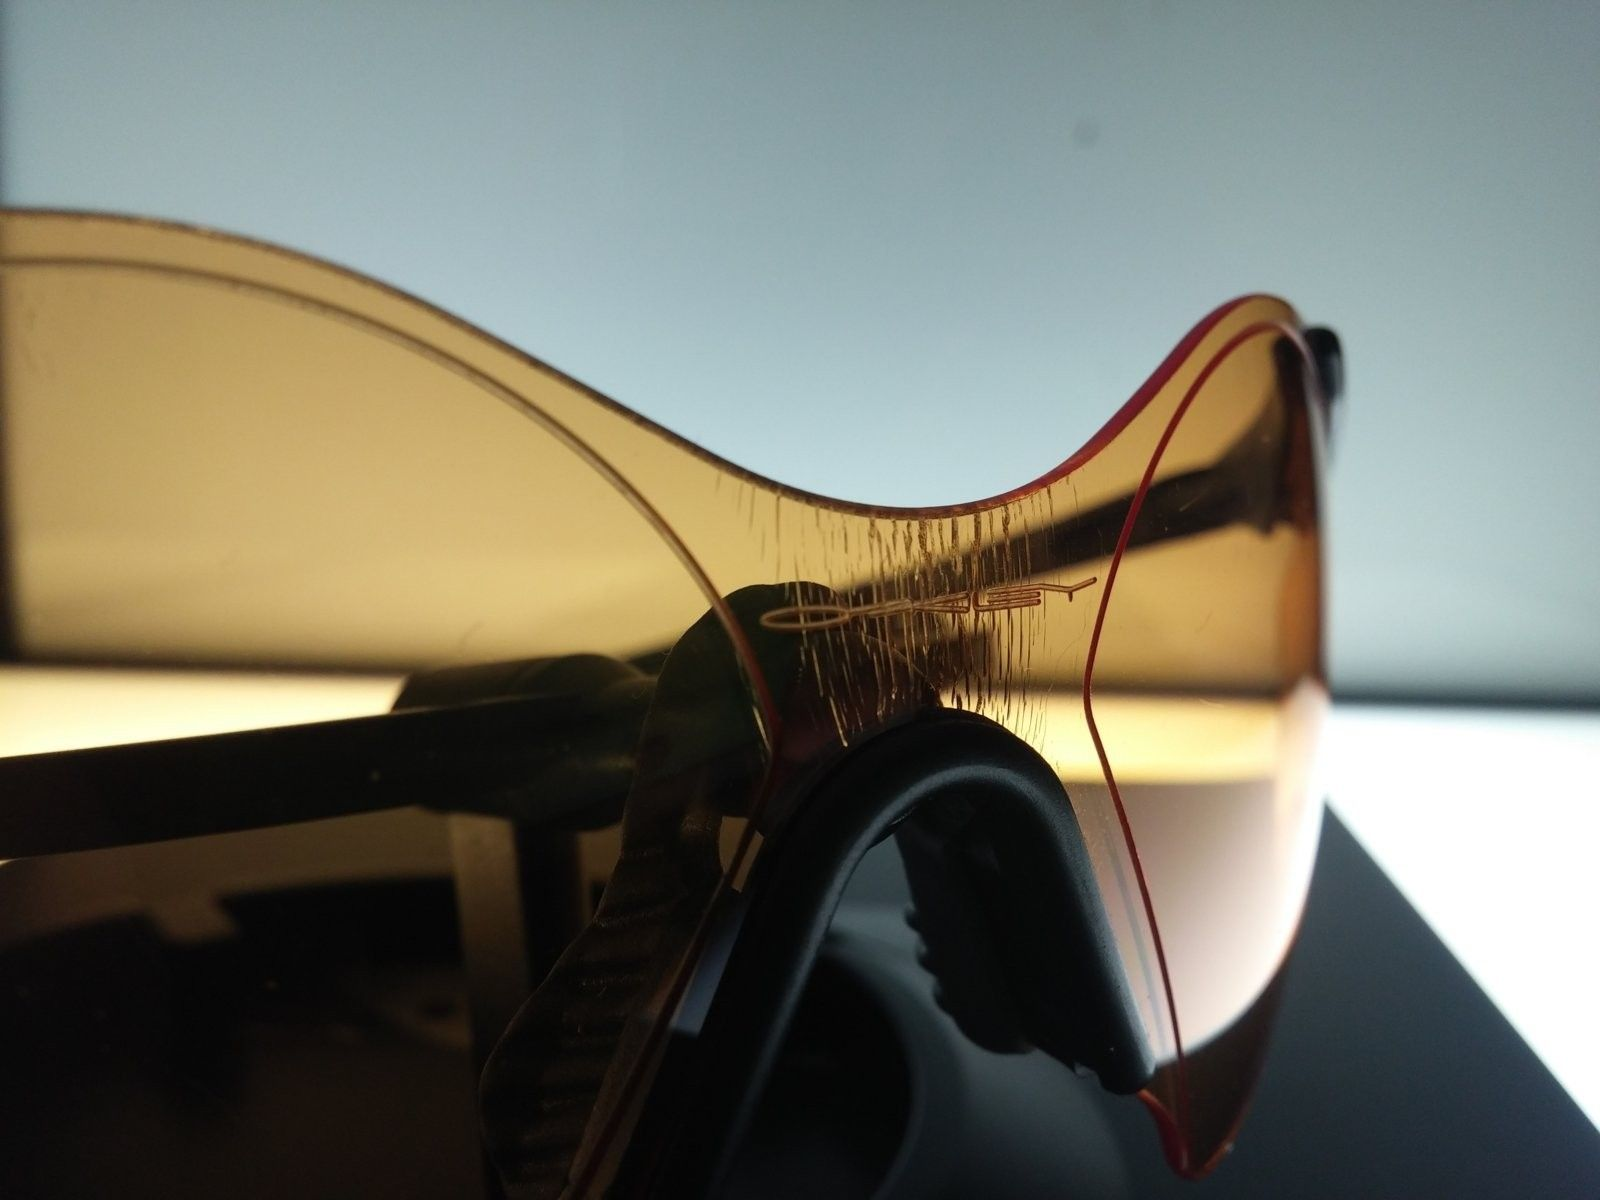 Oakley ZERO 0.6 CARBON FIBER PERSIMMON - 20160908_124030.jpg